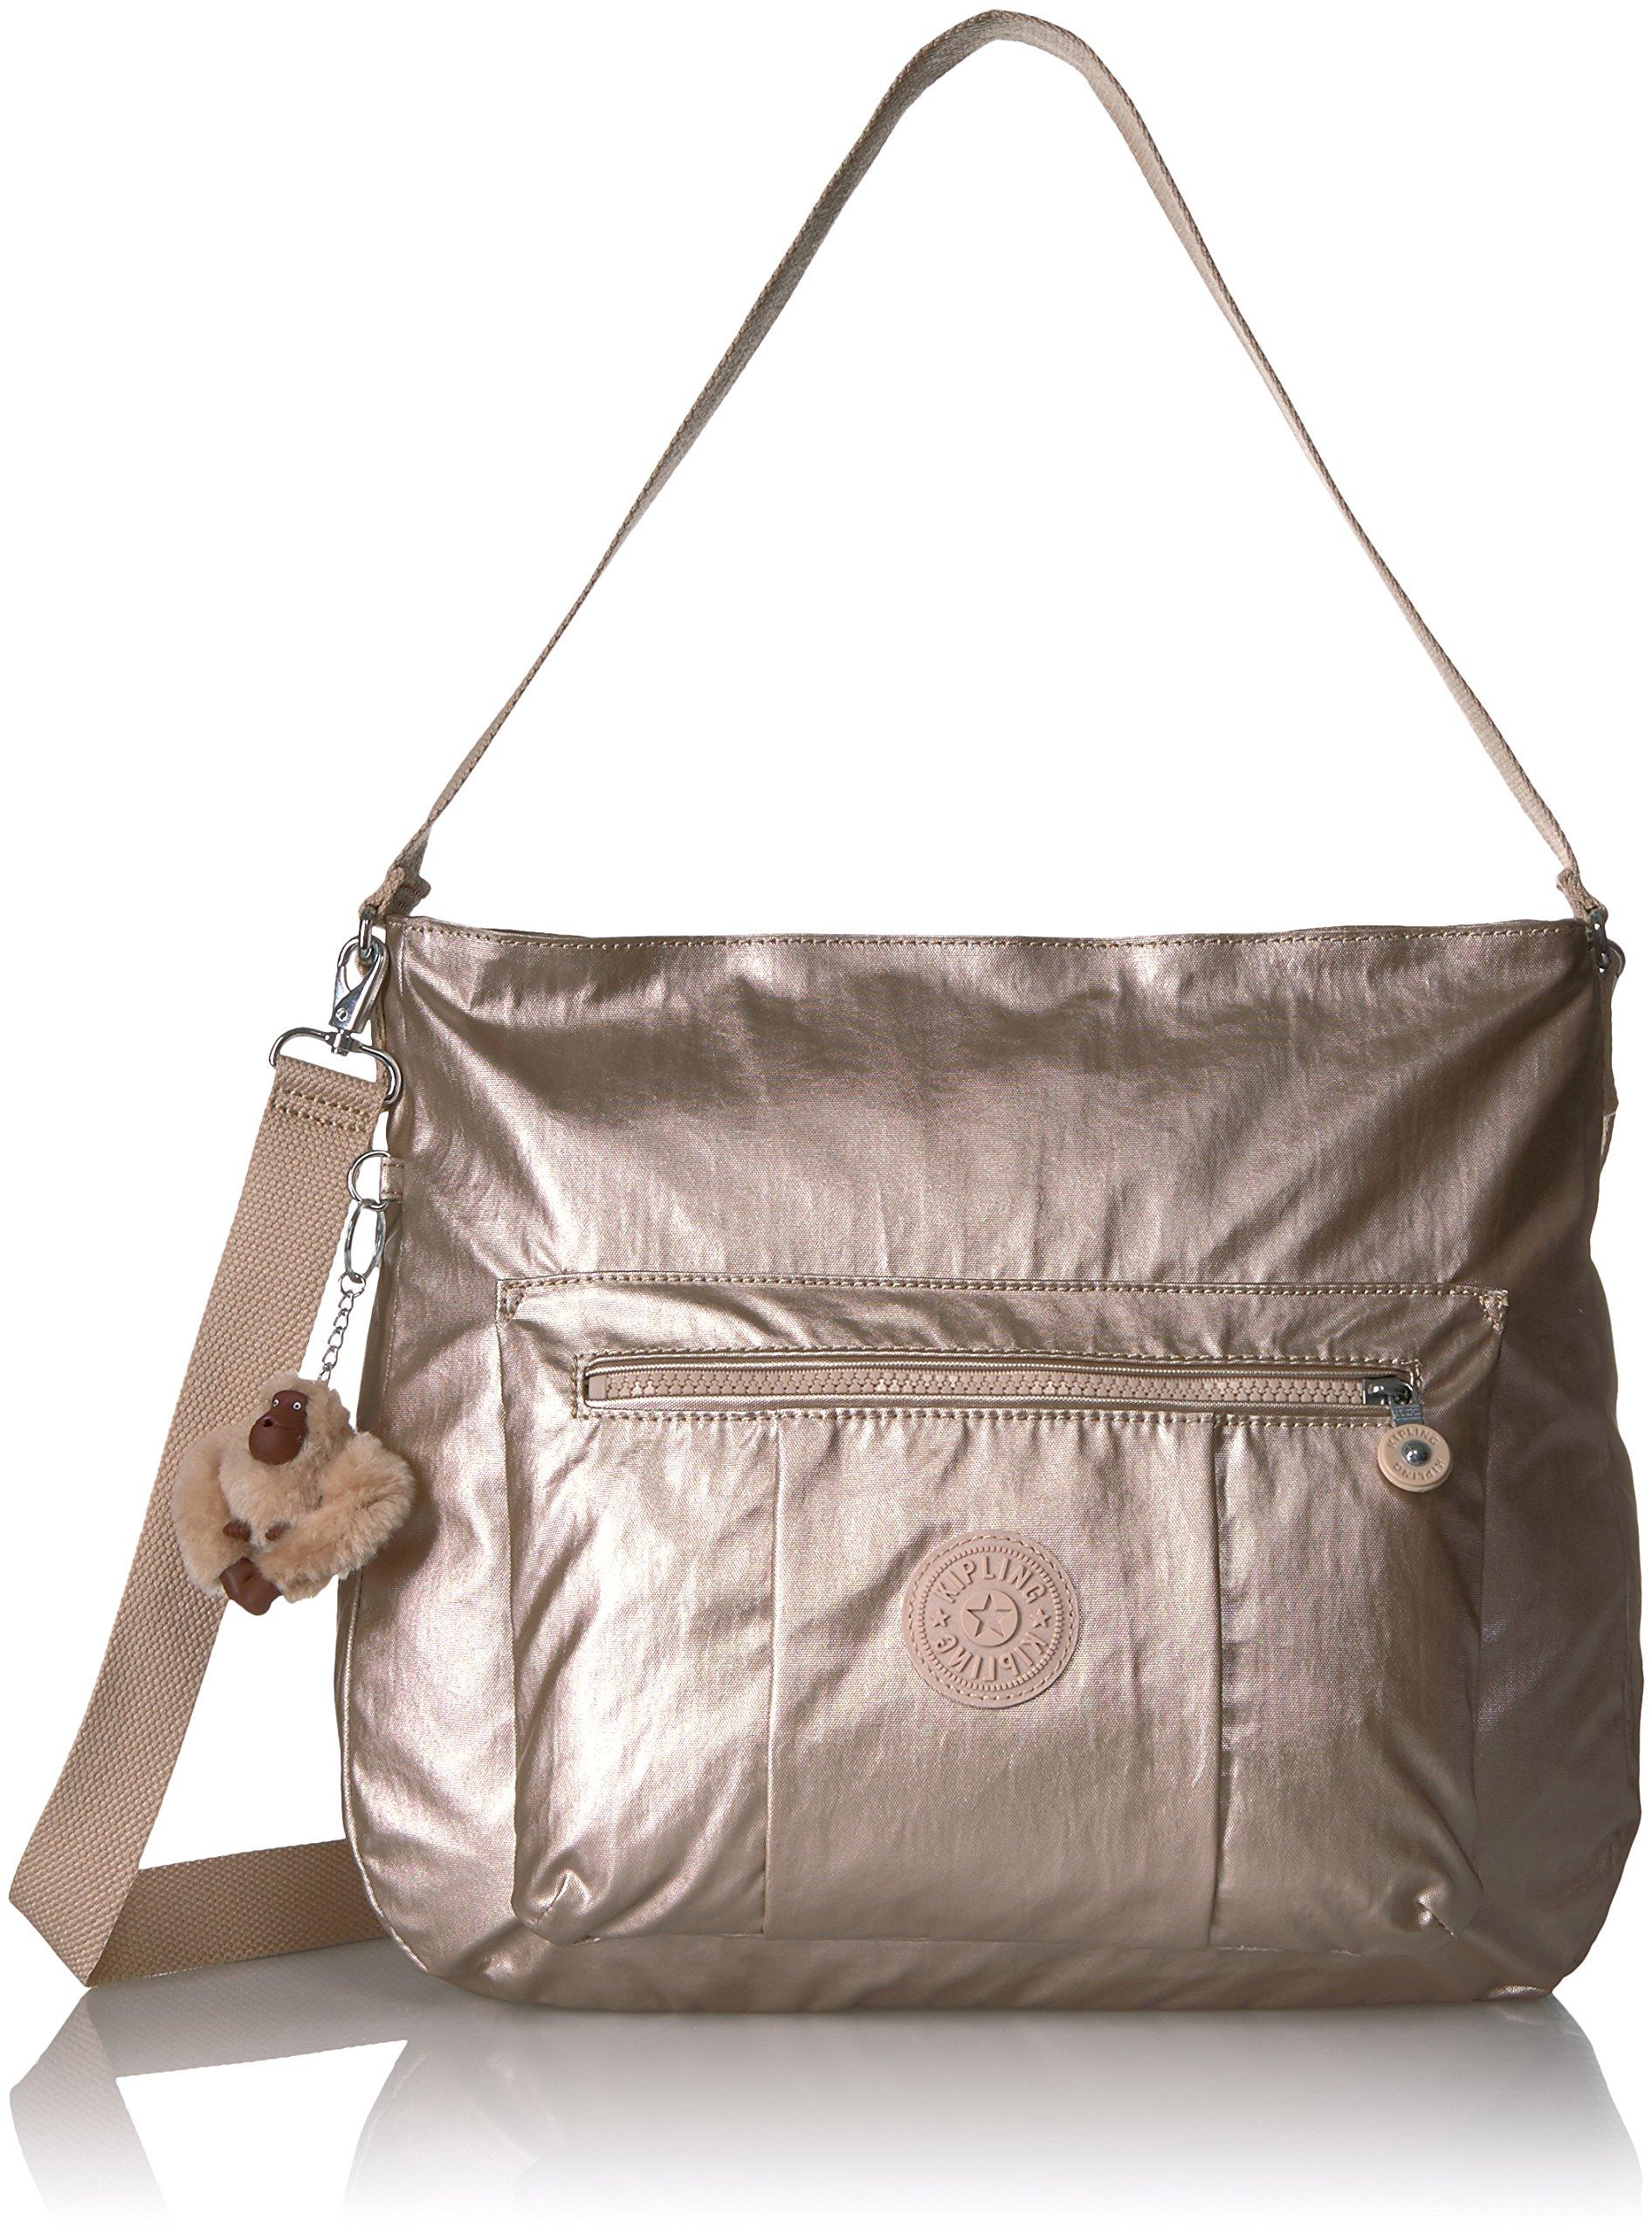 Kipling Carley Metallic Hobo Crossbody Bag, Sparklygld